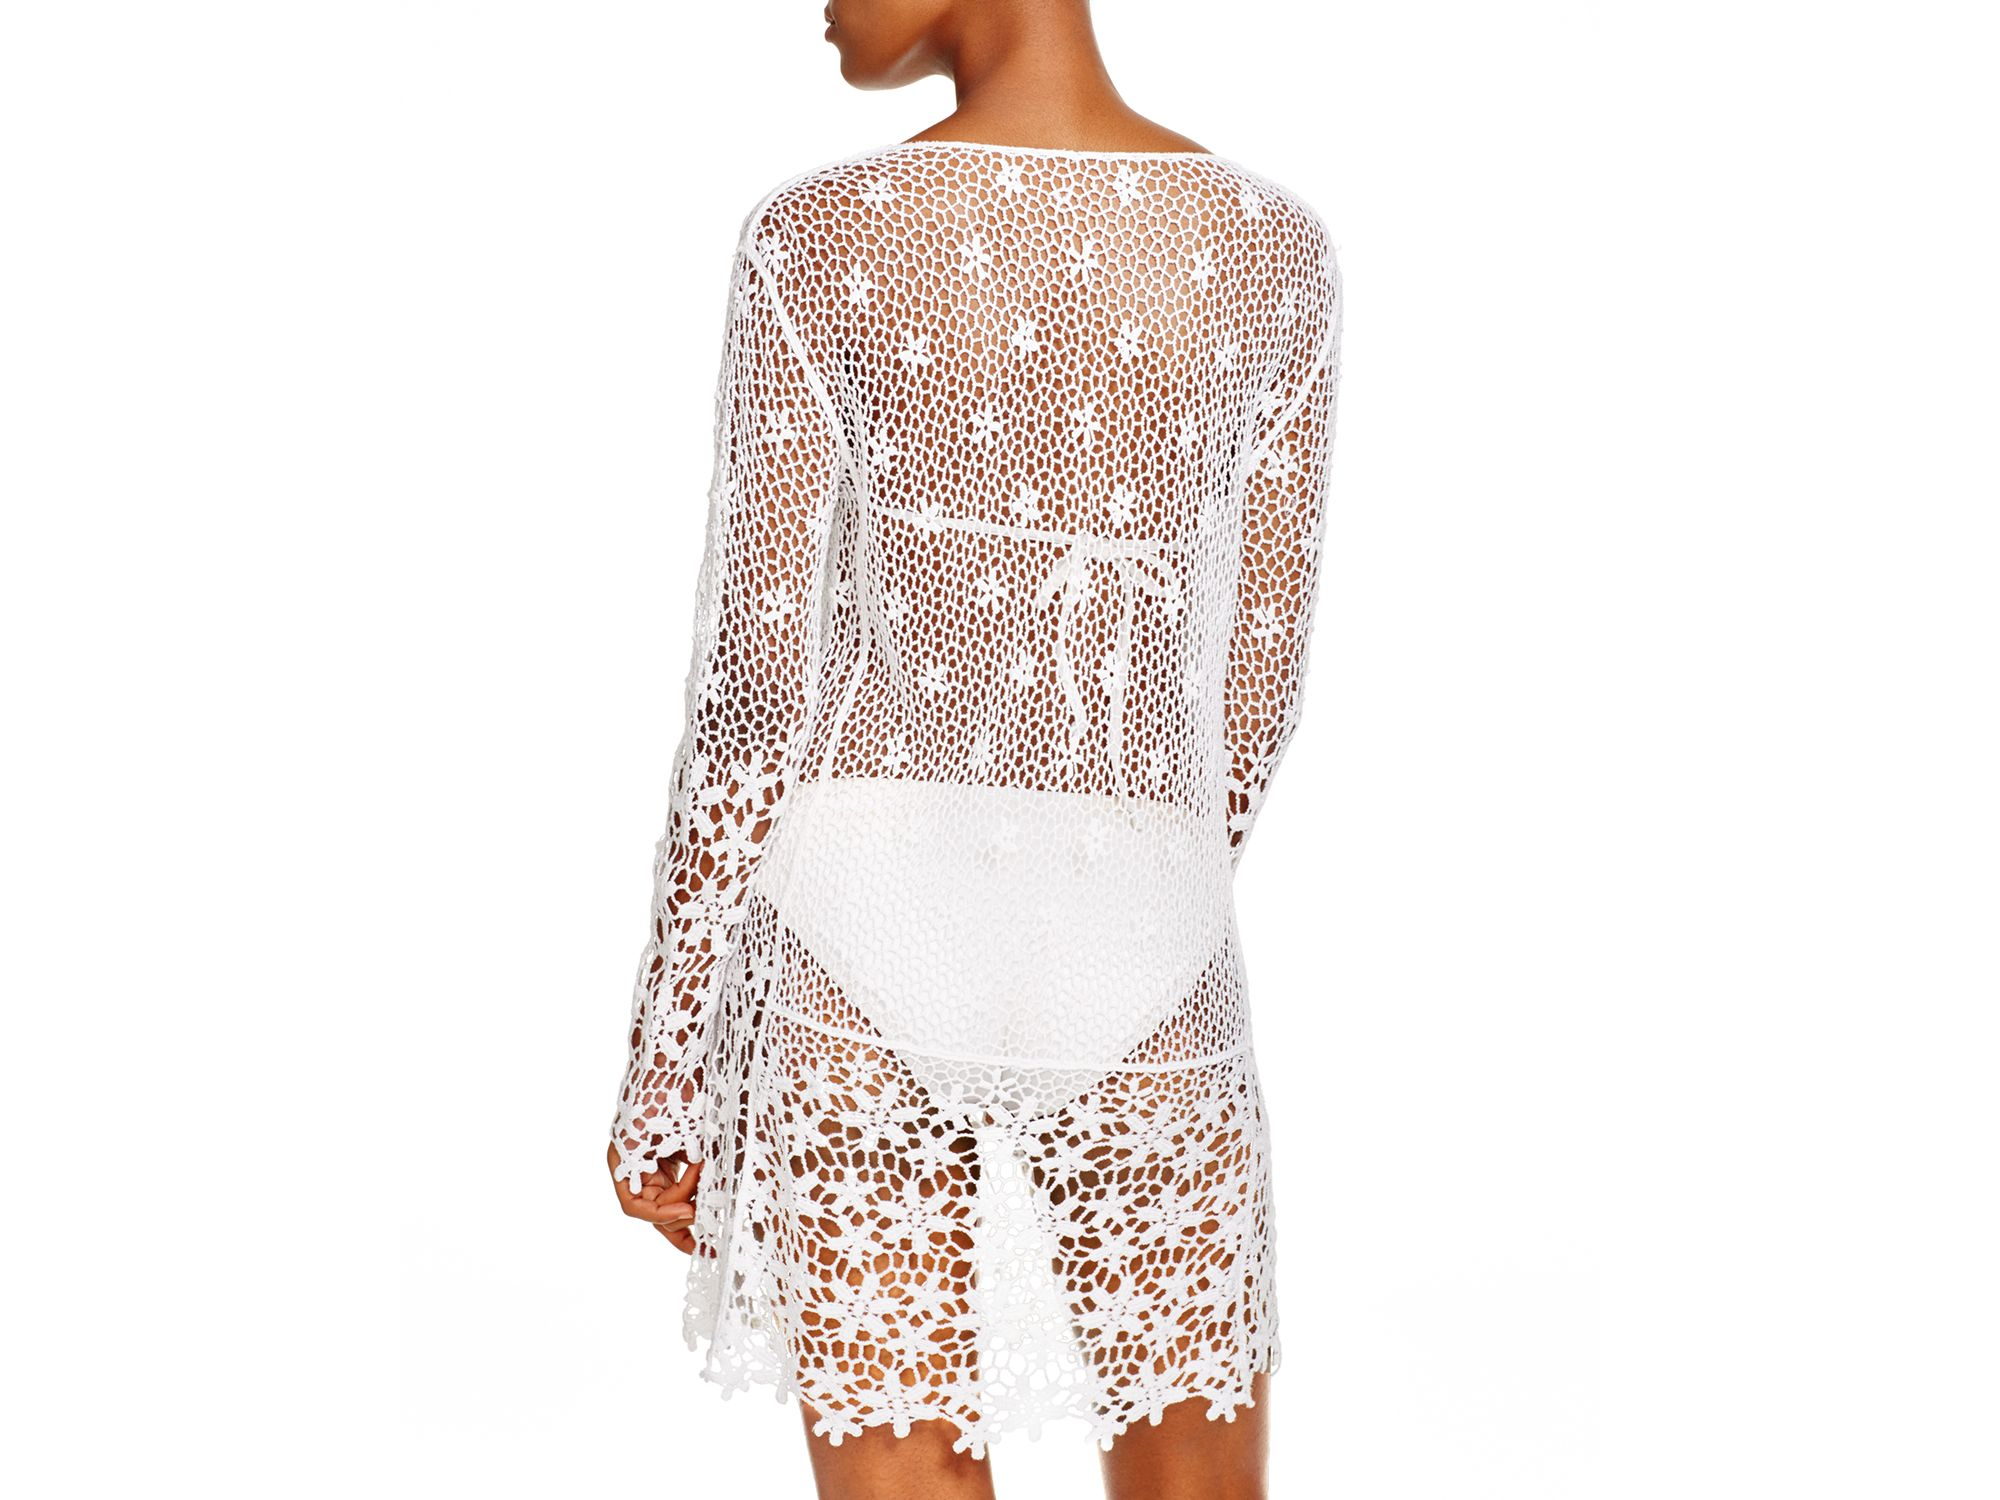 ba2ec2a74d J Valdi Crochet Cotton Mini Dress in White - Lyst